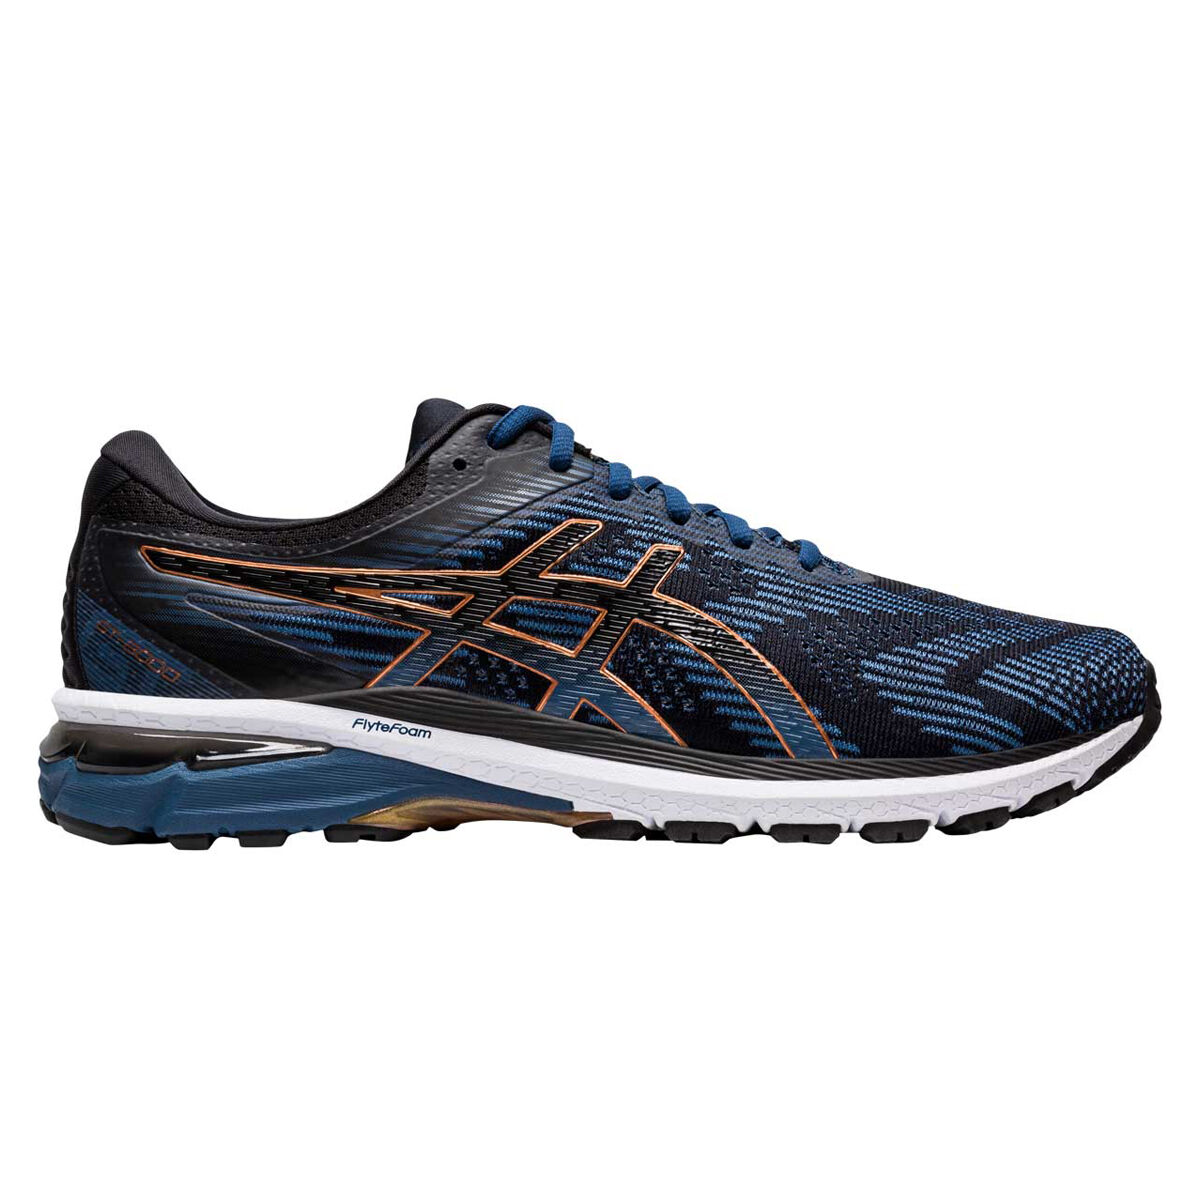 Asics GT 2000 8 2E Mens Running Shoes